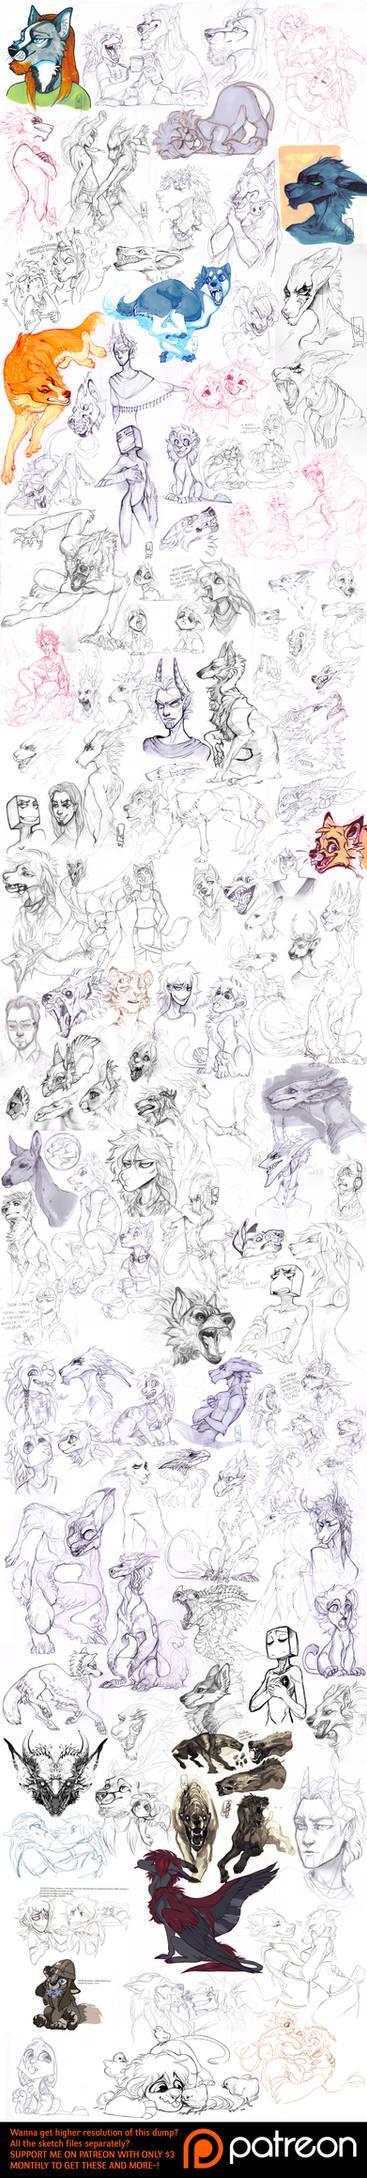 Sketch dump 60